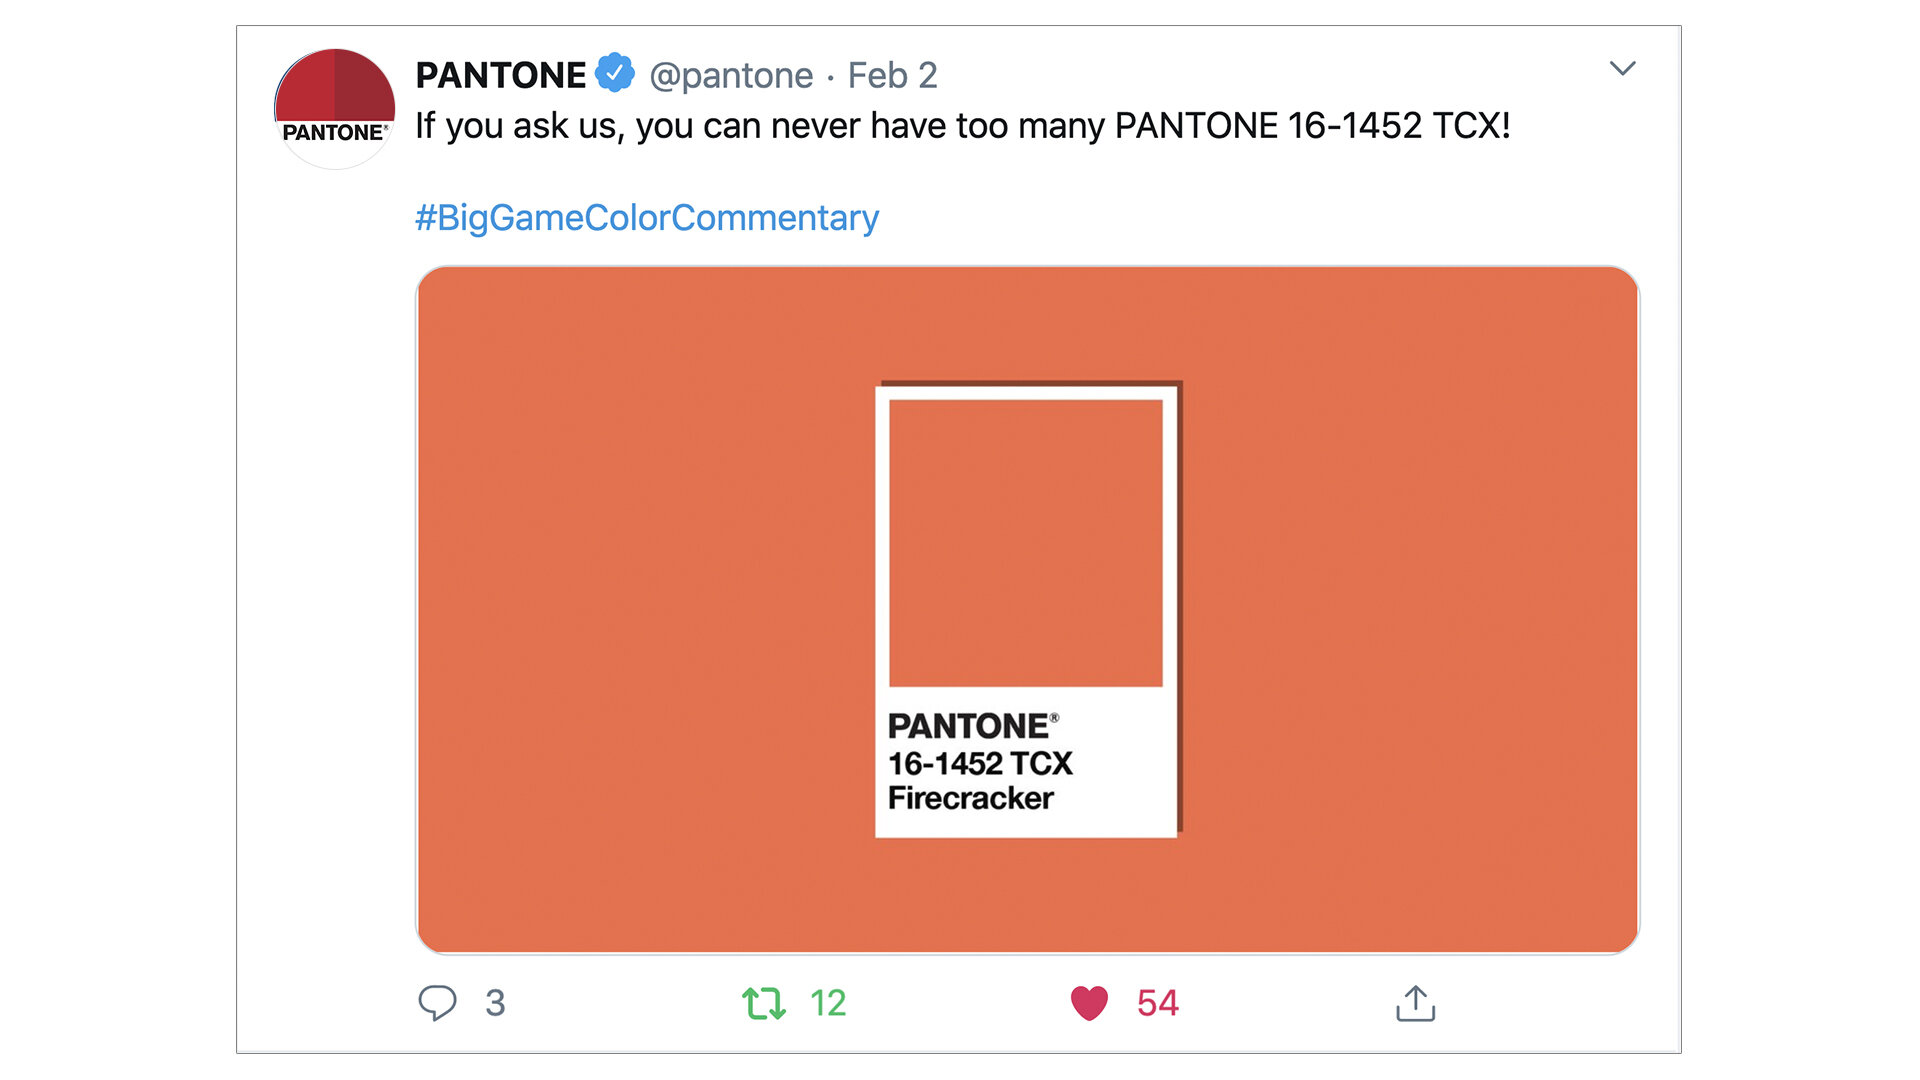 PANTONE_TheDayOf_FireCracker